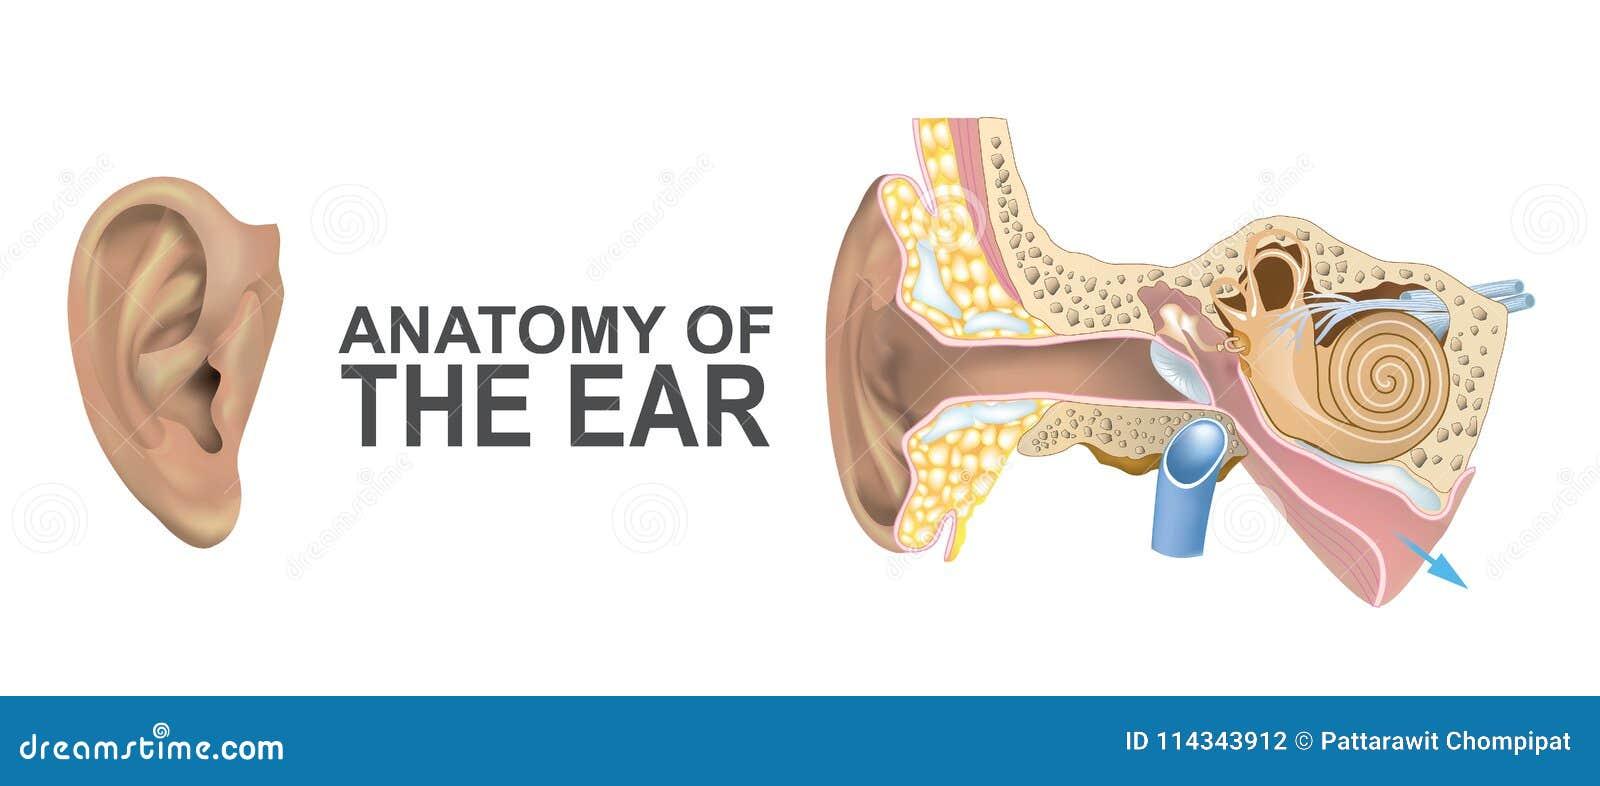 Anatomy Ear Stock Illustrations – 1,992 Anatomy Ear Stock ...